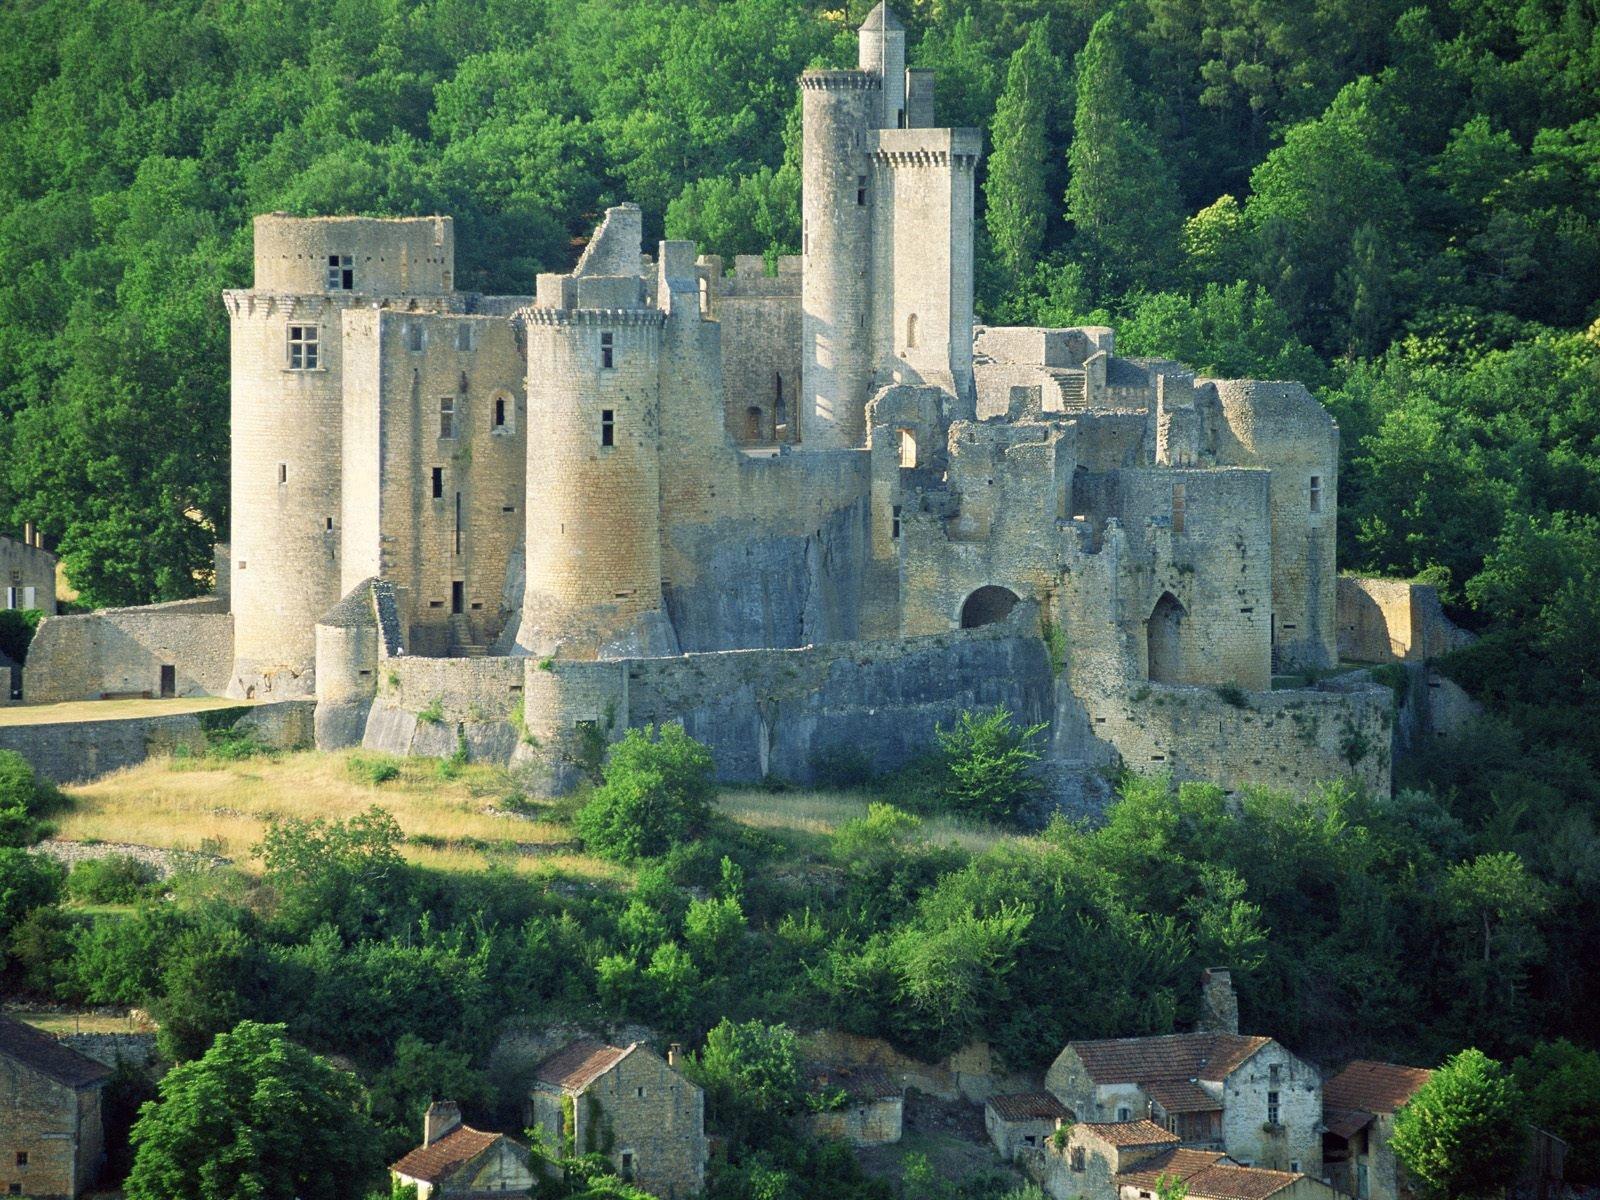 castle wallpaper nice france - photo #9